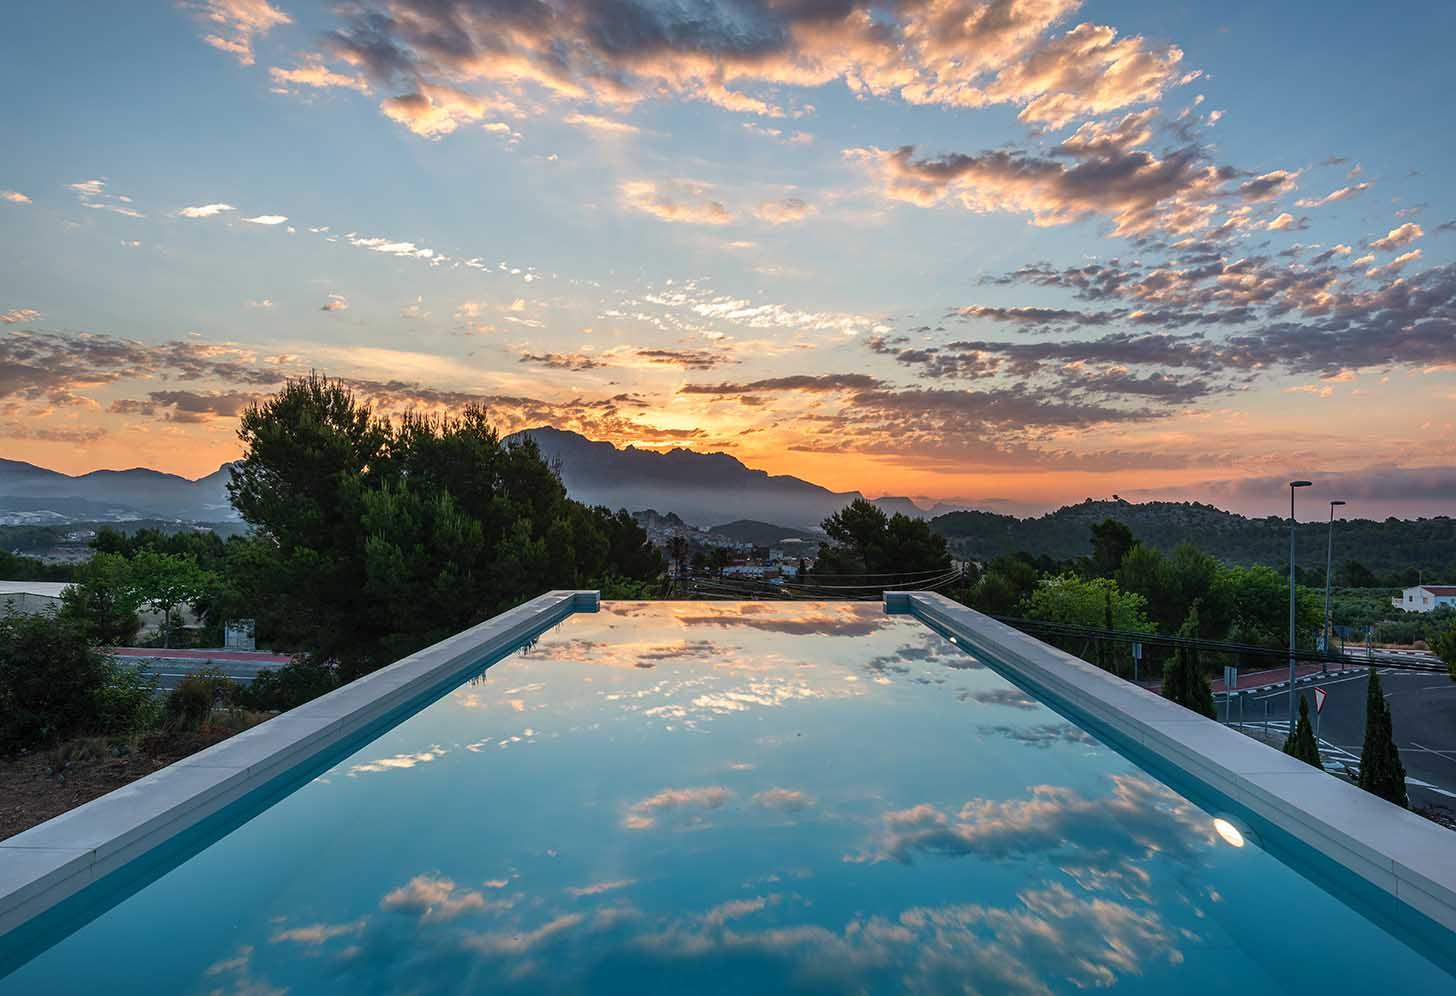 immobilier neuf espagne costa blanca alicante polop piscine